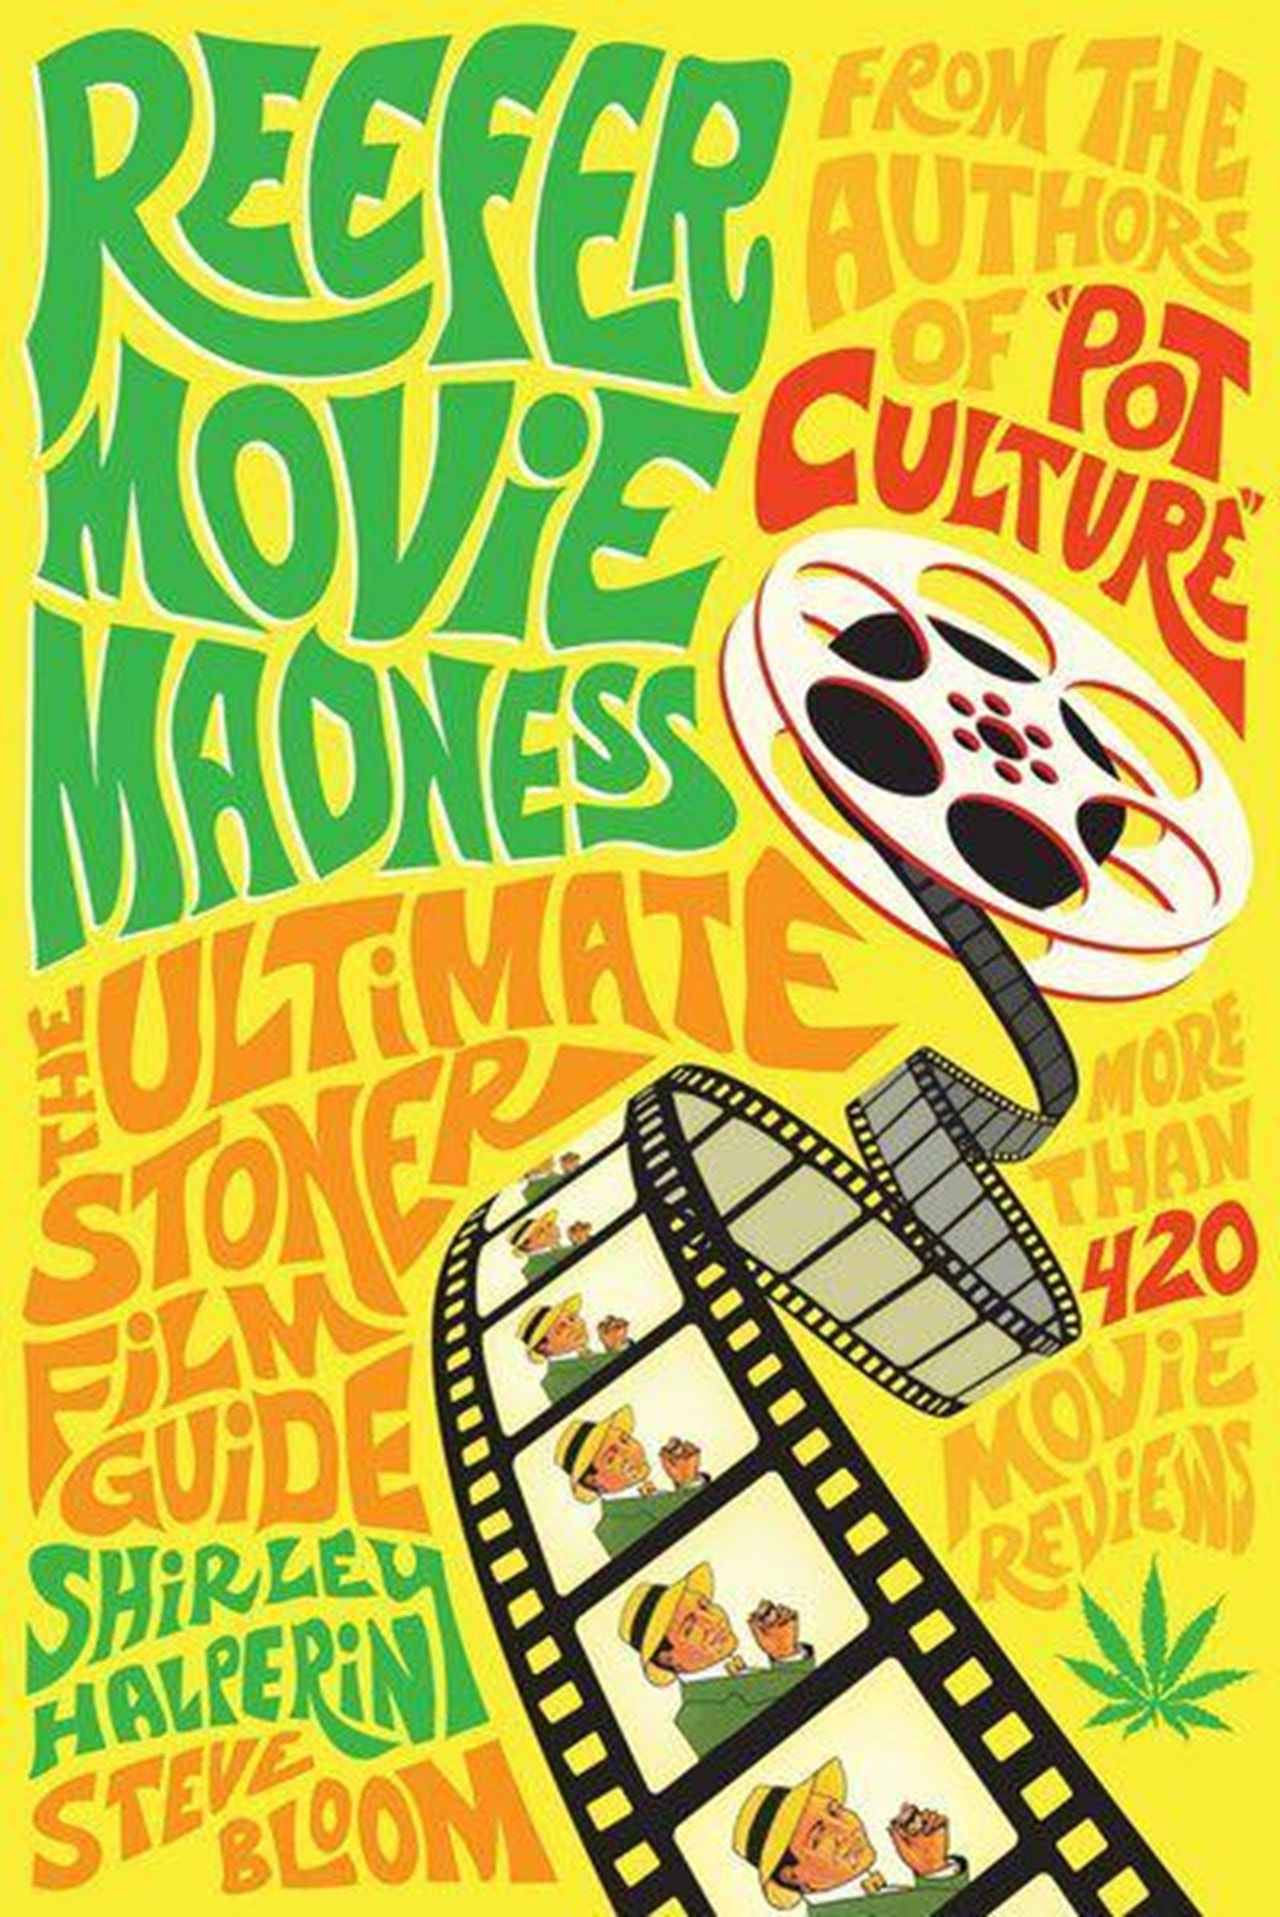 Reefer Movie Madness: Stoner Film Guide - 1